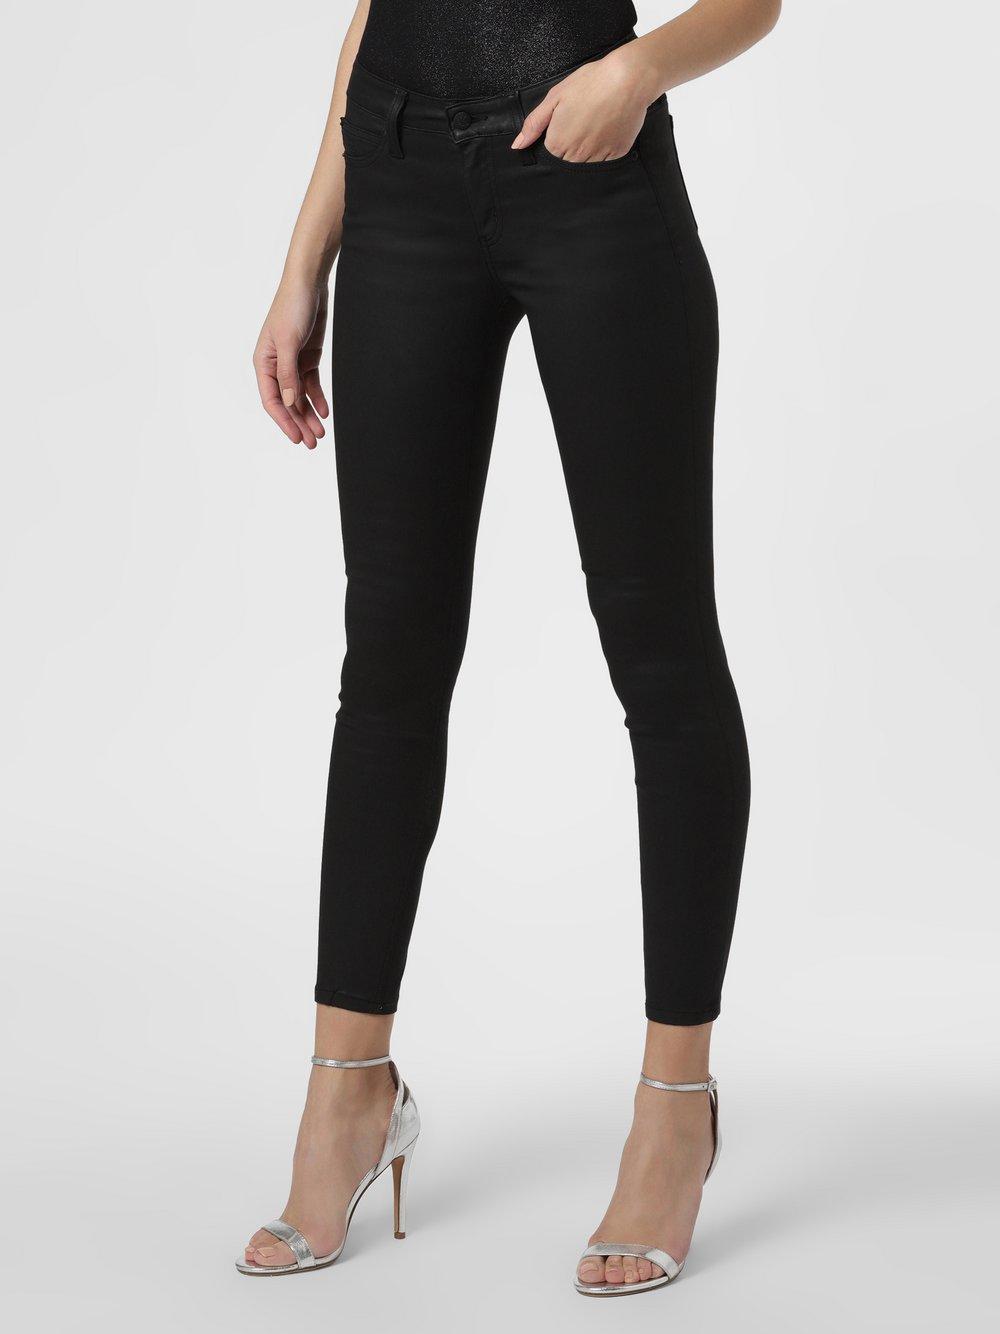 Calvin Klein Jeans - Spodnie damskie, czarny Calvin Klein Jeans